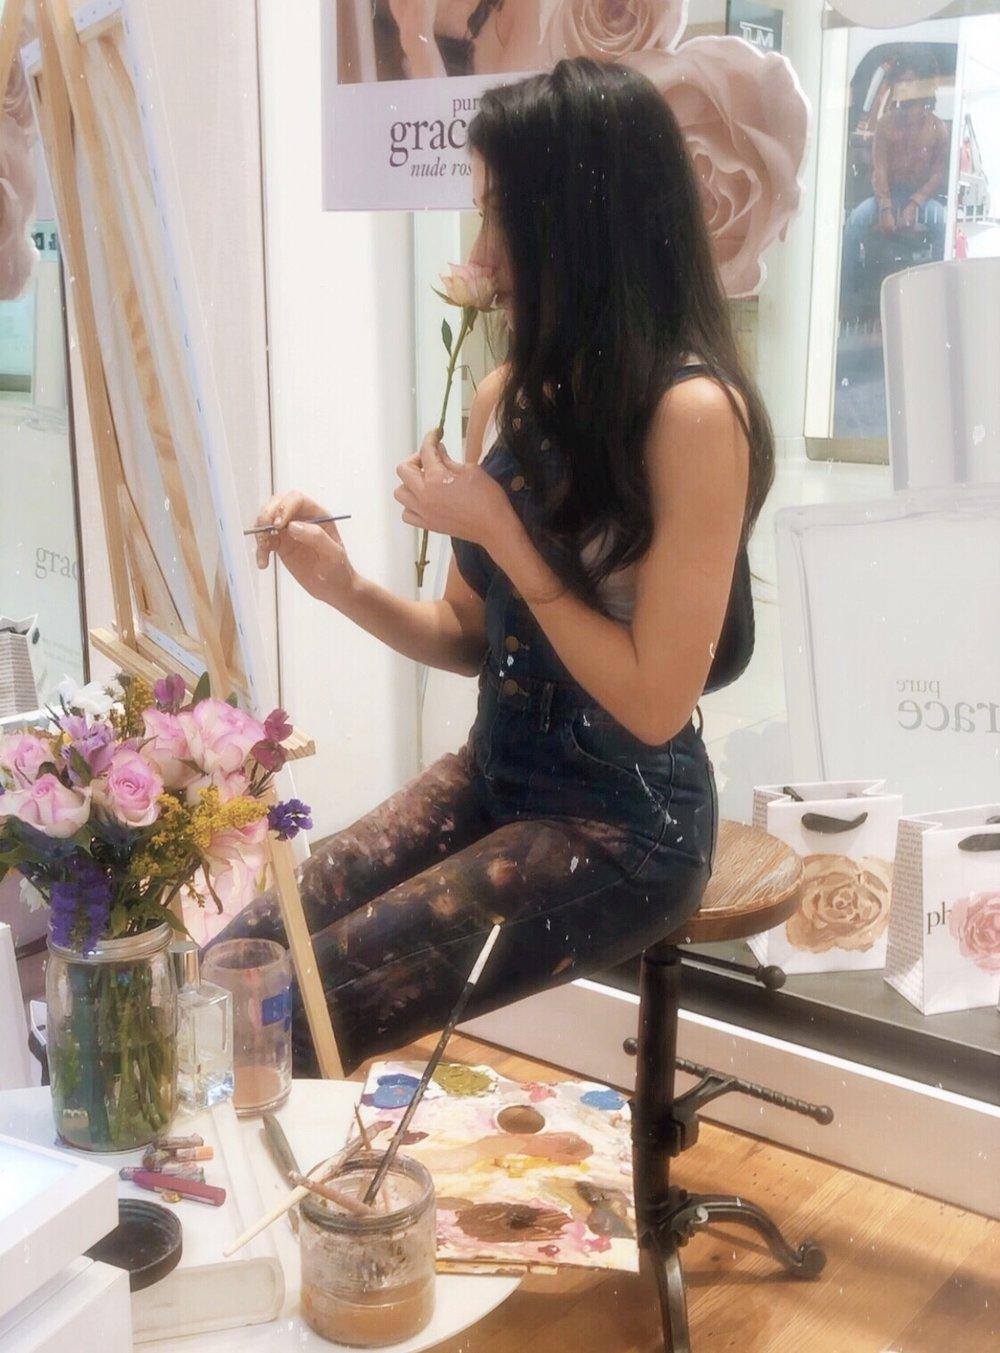 katrina-eugenia-philosophy-skincare-love-philosophy-amazing-grace-amazing-grace-ballet-rose-live-painting-oil-painting97.jpg